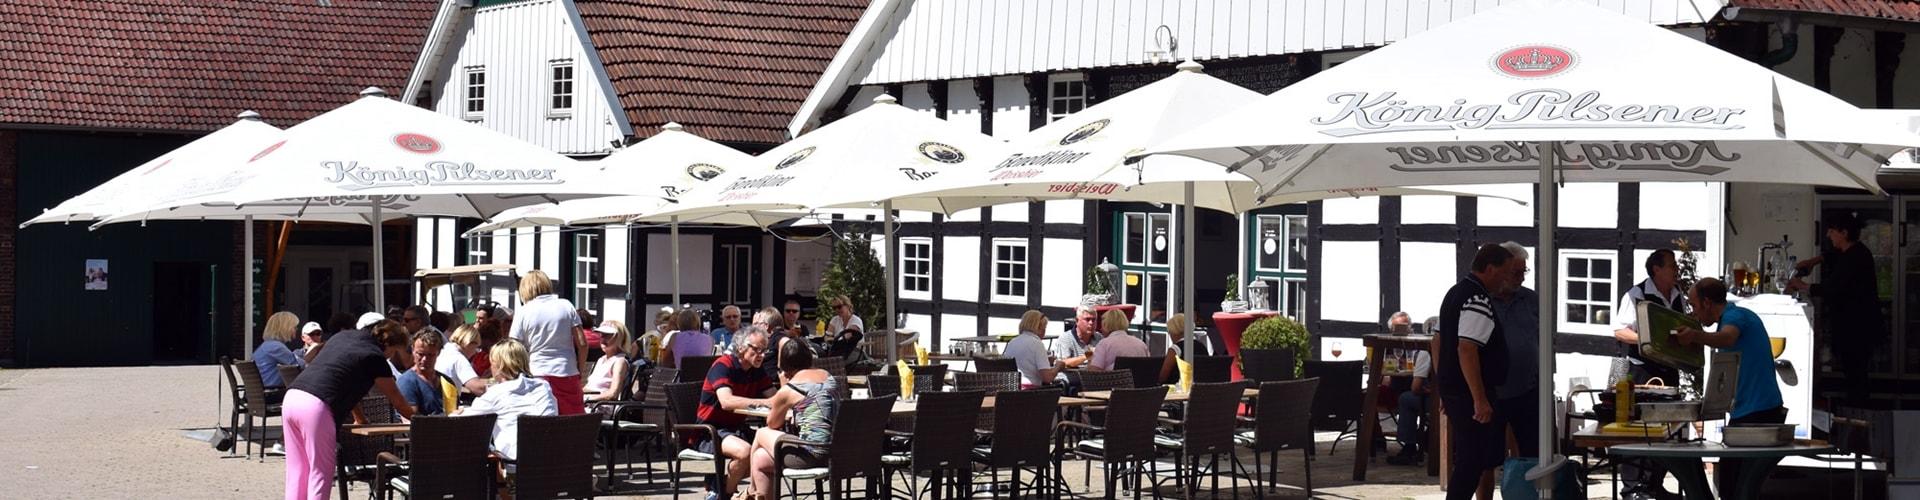 Clubhaus Nölkenhöners Hof Golfclub Ravensberger Land e.V.